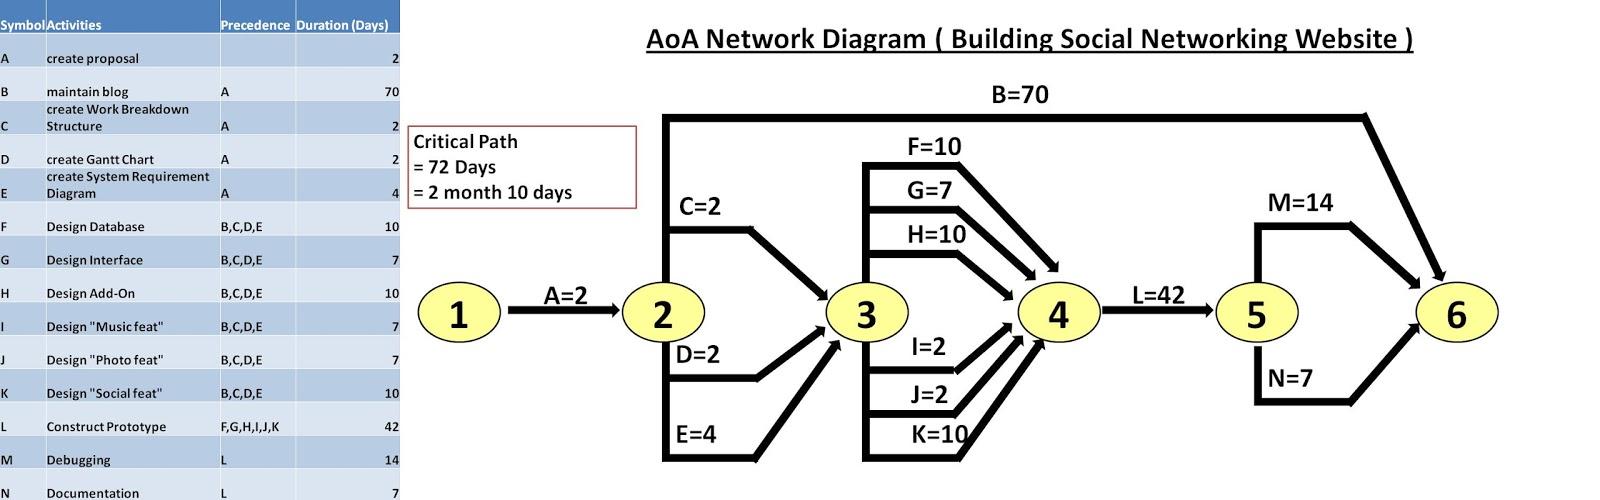 aoa network diagram building social networking website ver 1 [ 1600 x 500 Pixel ]